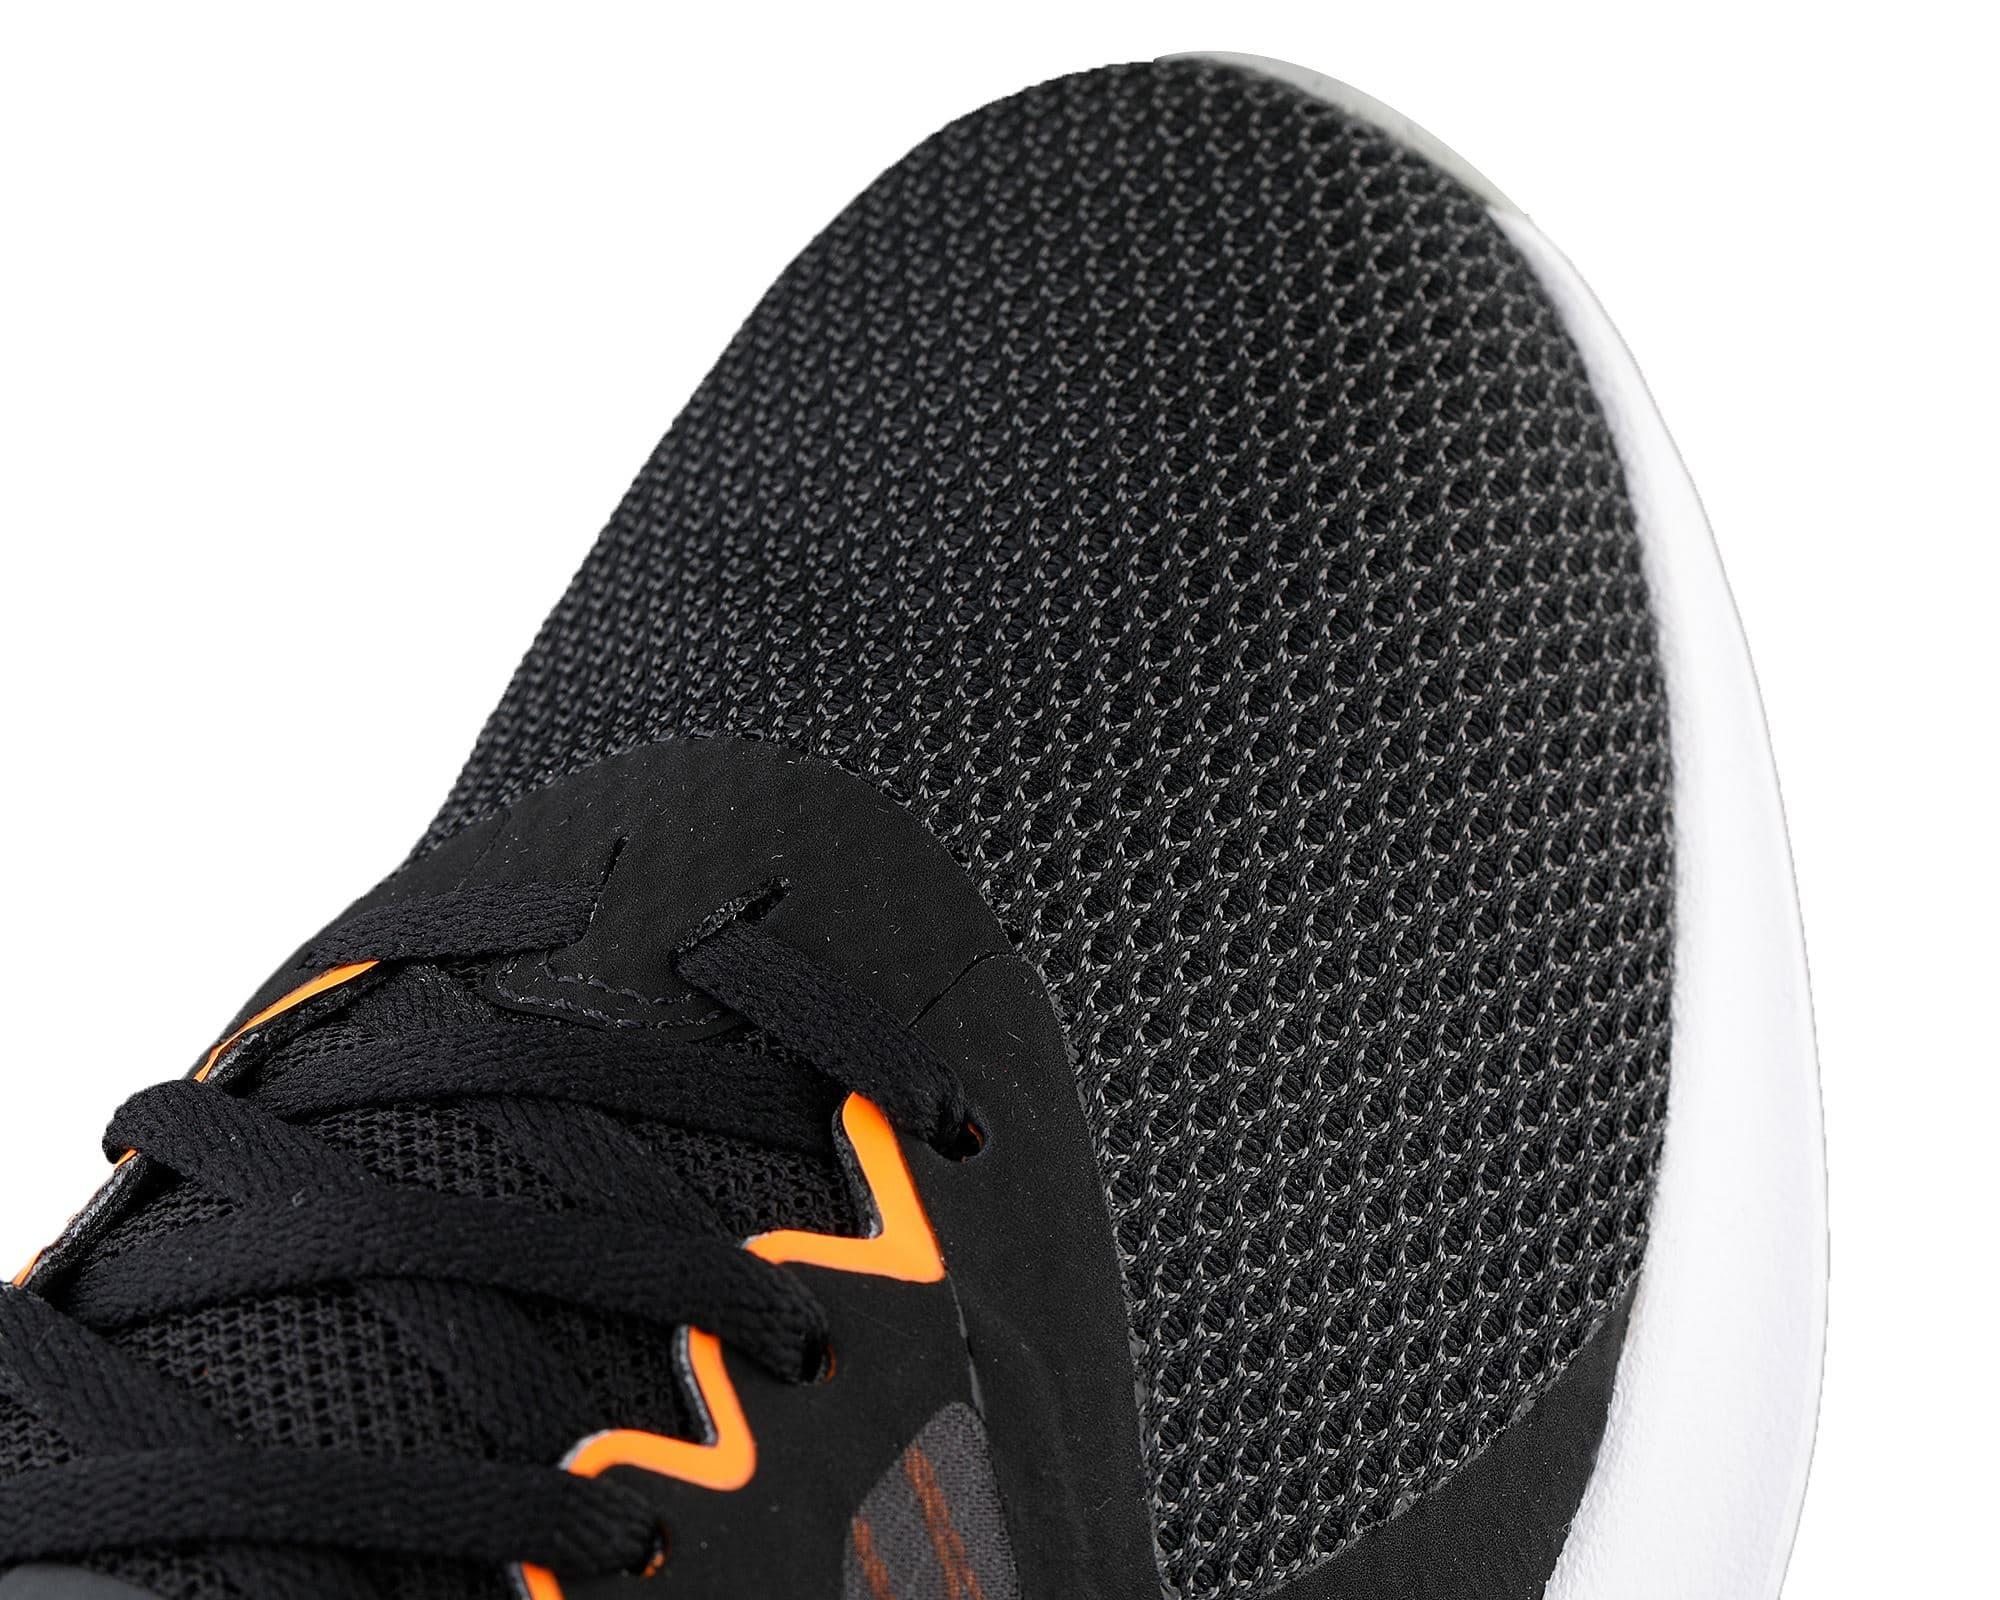 Downshifter 11 Erkek Siyah Koşu Ayakkabısı (CW3411-001)